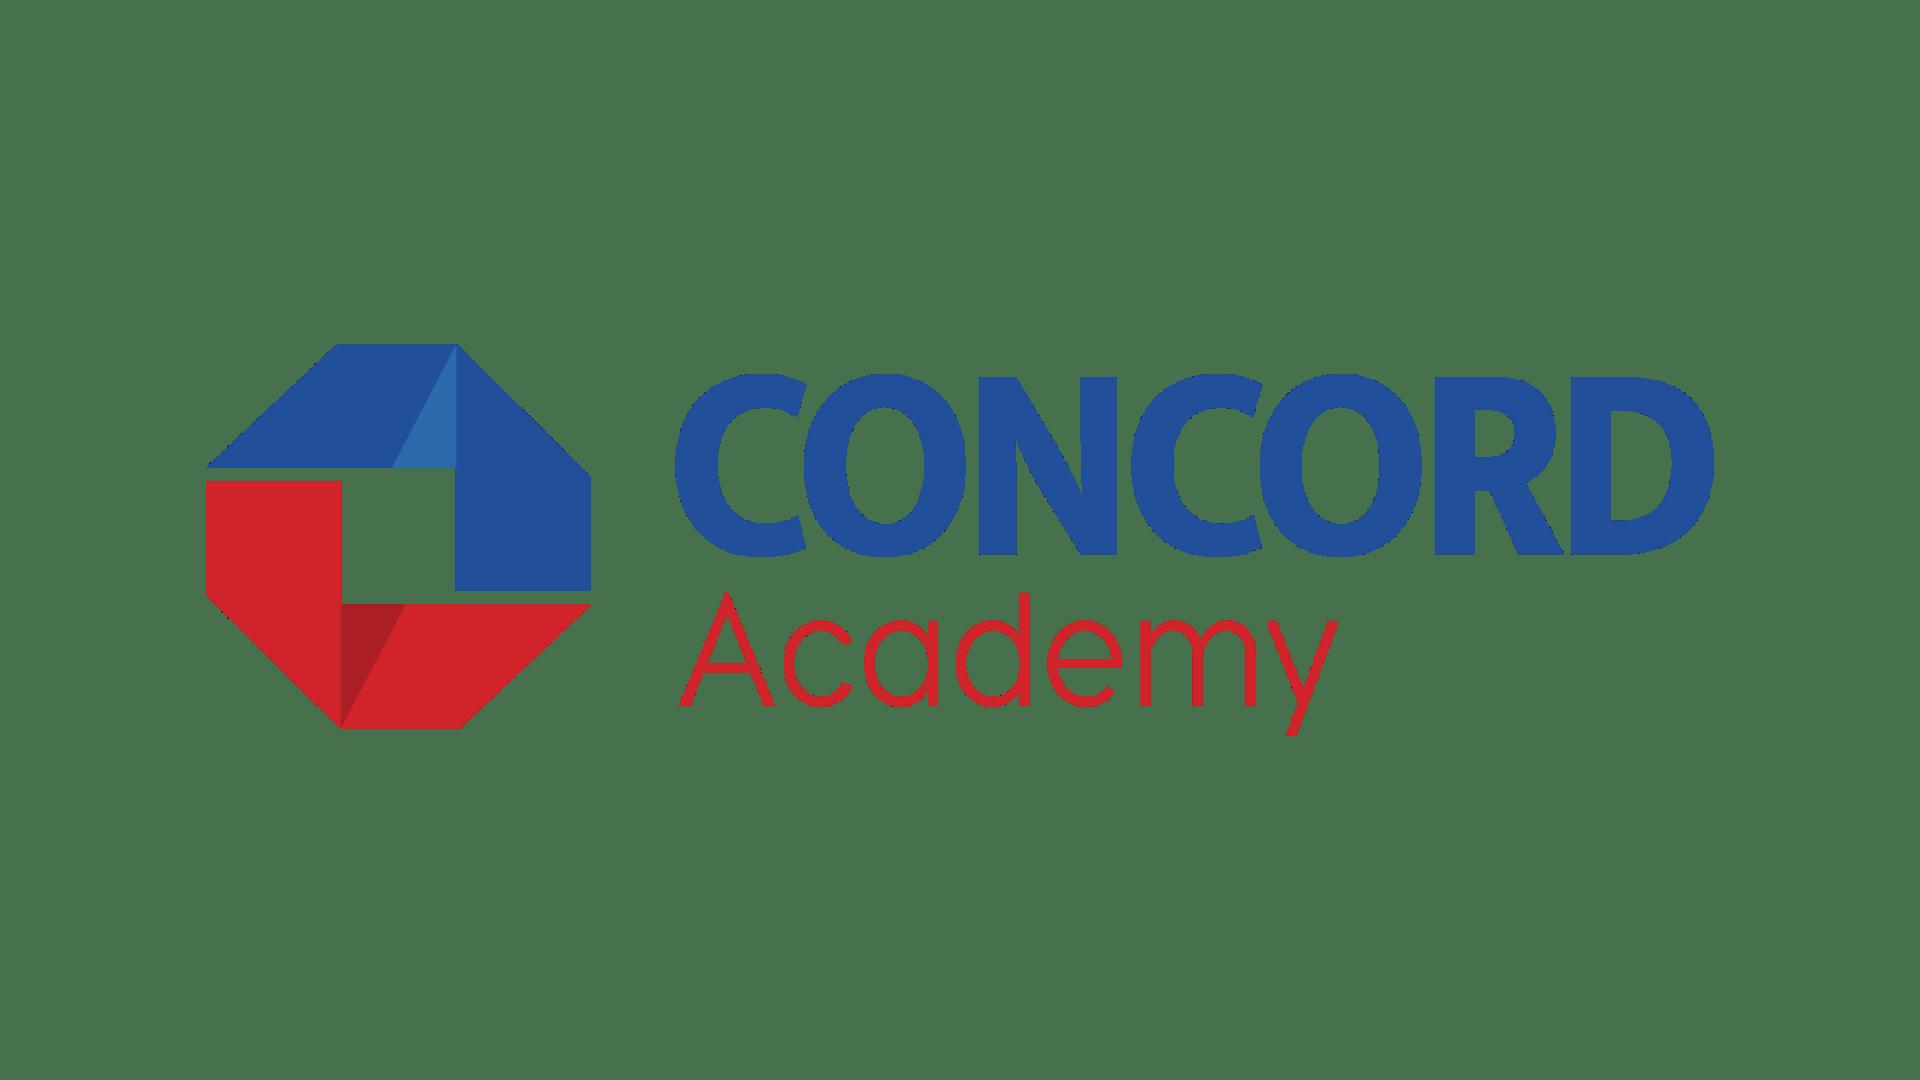 concord academy logo